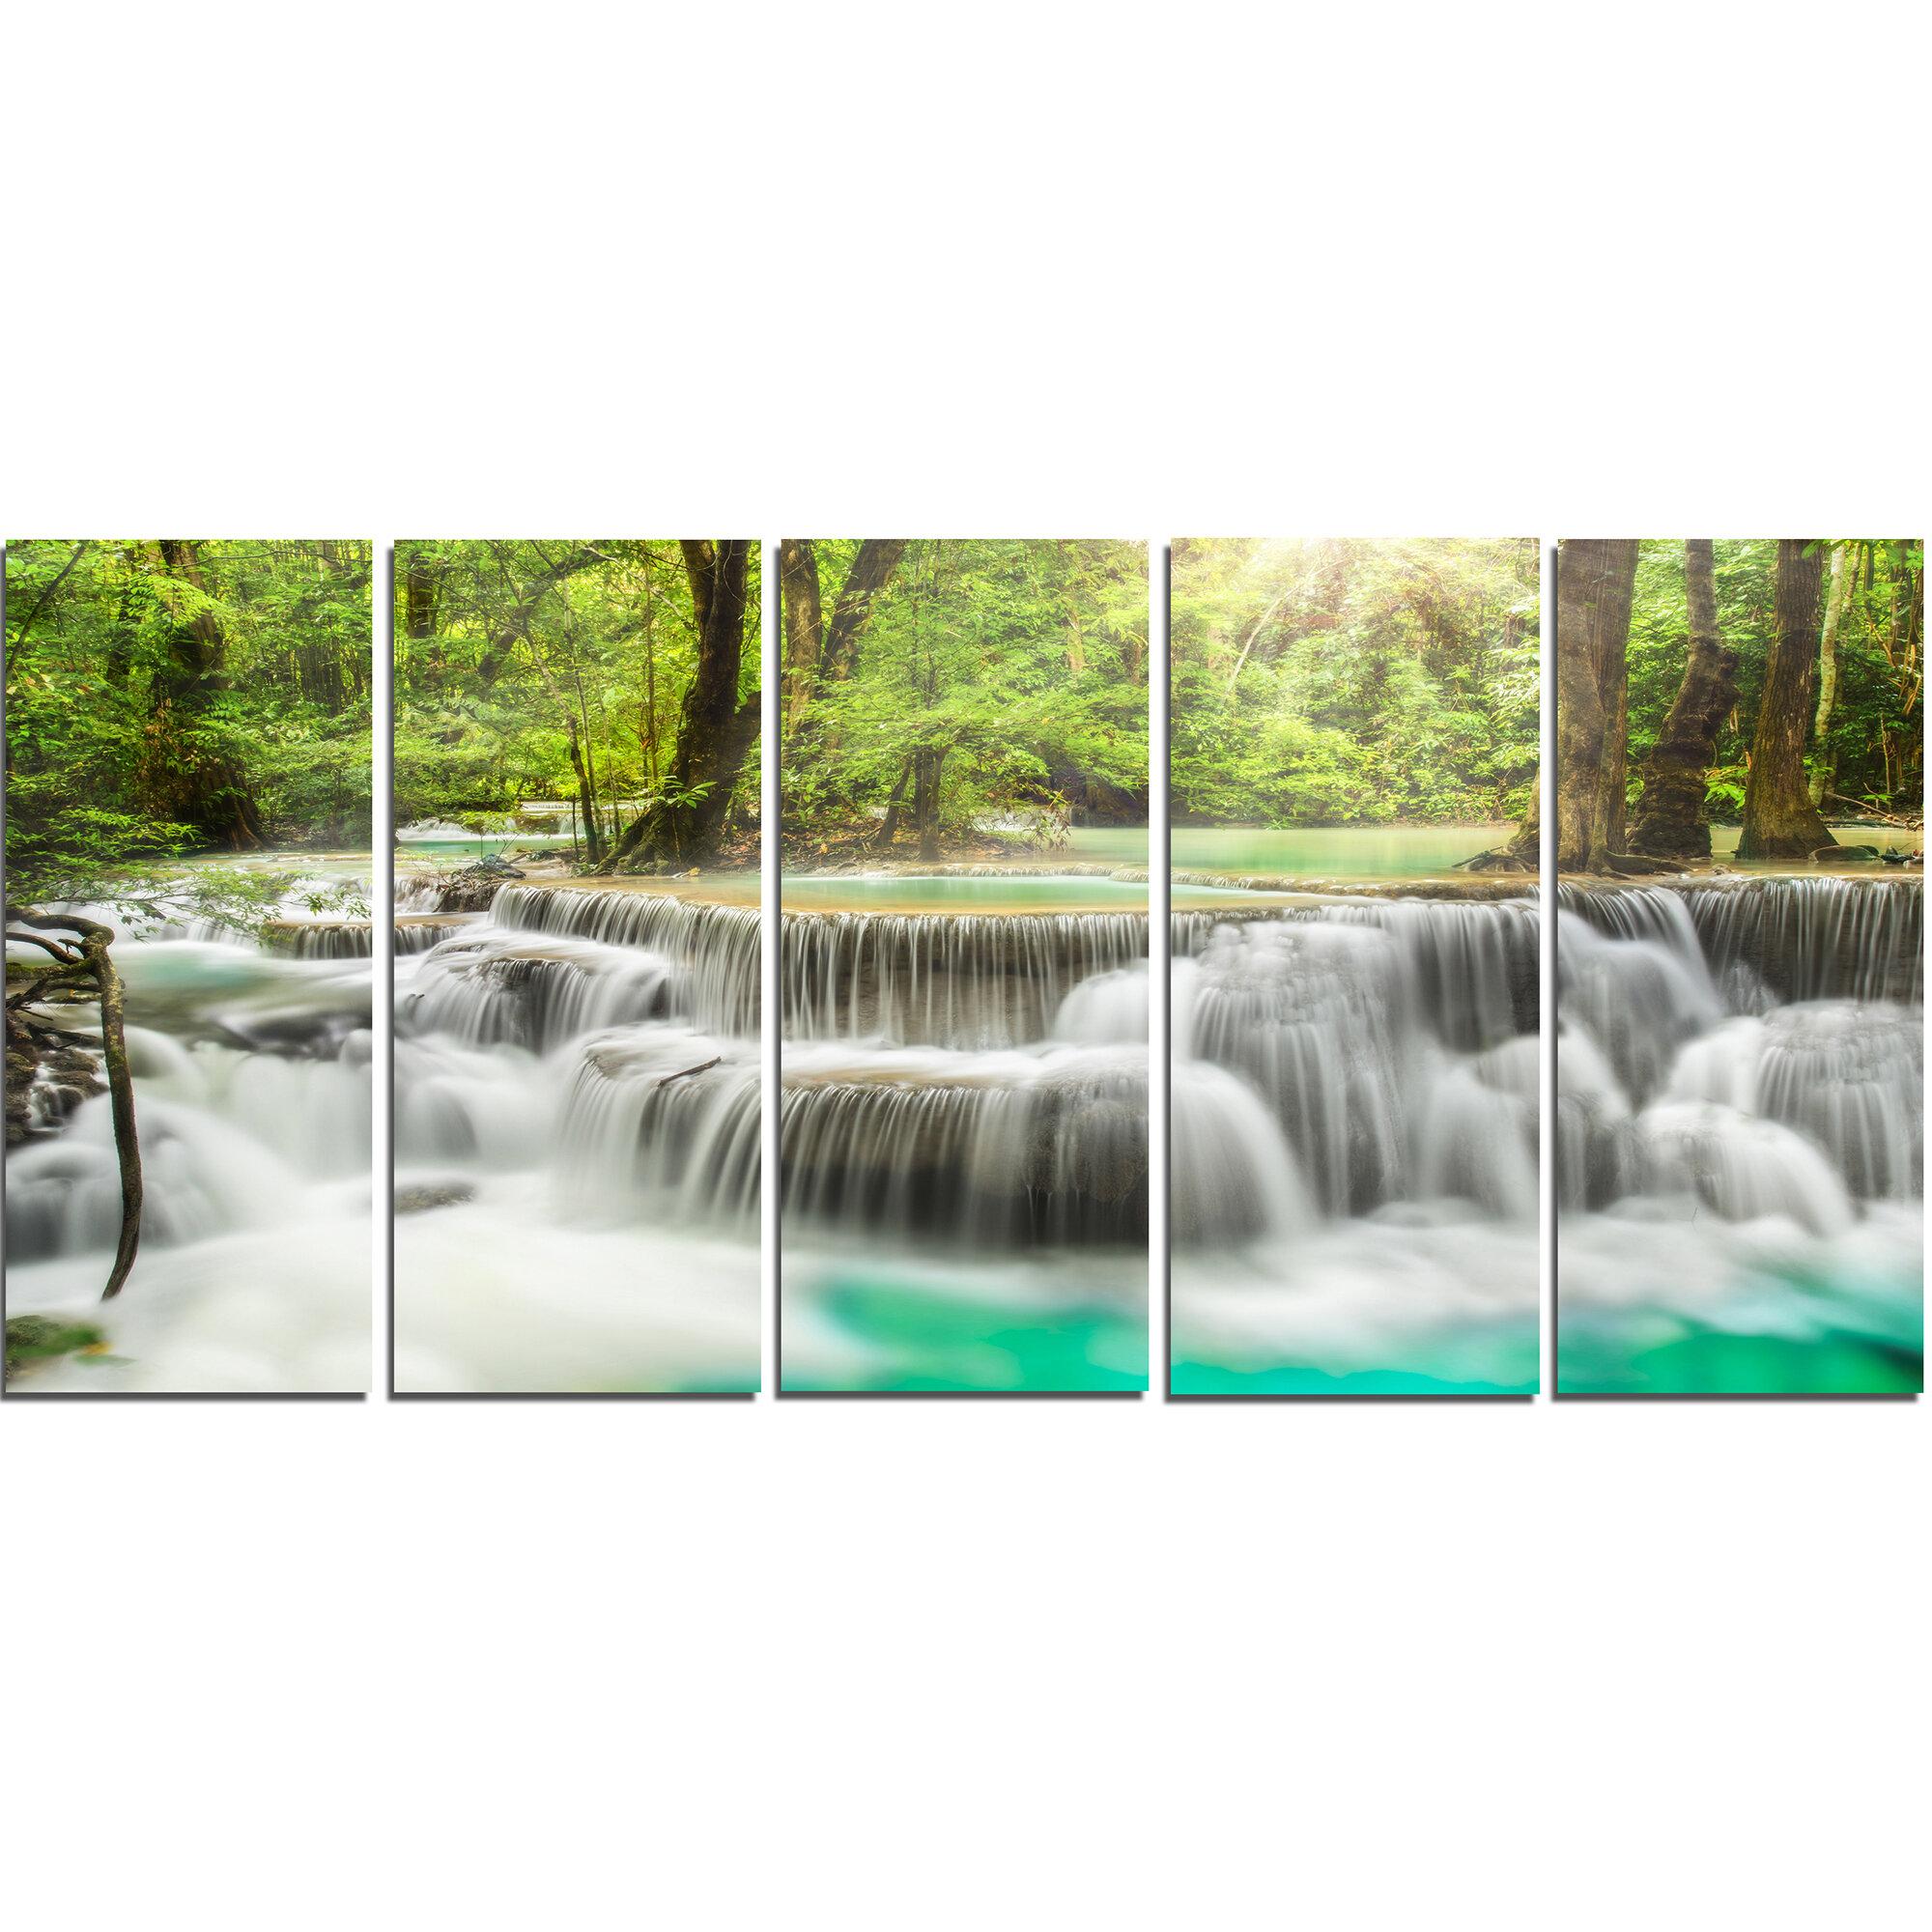 Designart Kanchanaburi Erawan Waterfall 5 Piece Wall Art On Wrapped Canvas Set Wayfair